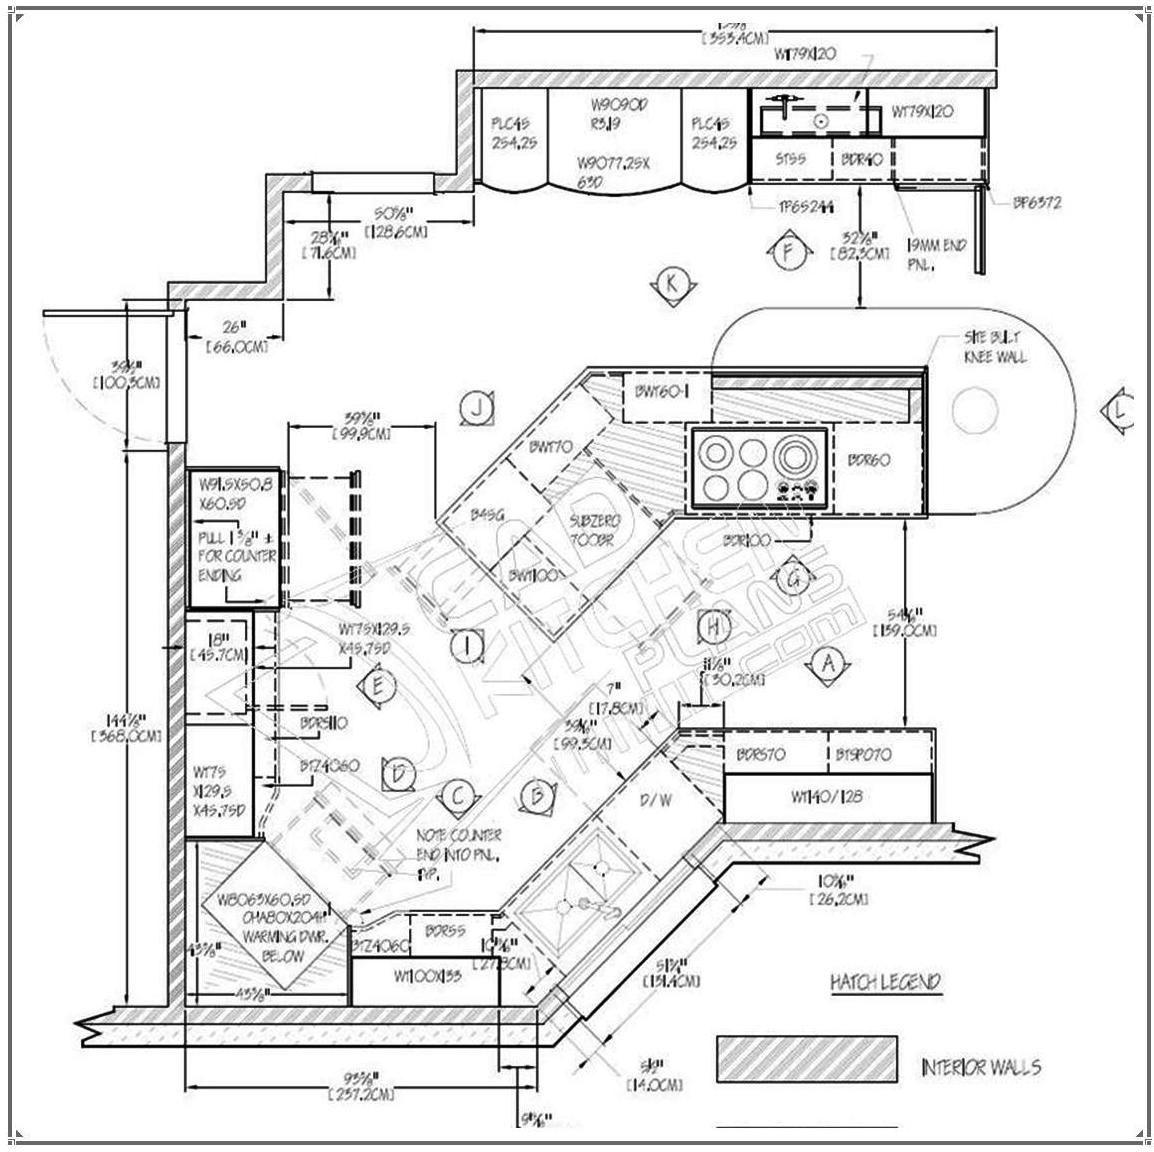 CadKitchenPlans.com | Portfolio-2D AutoCad | Projects to Try ...